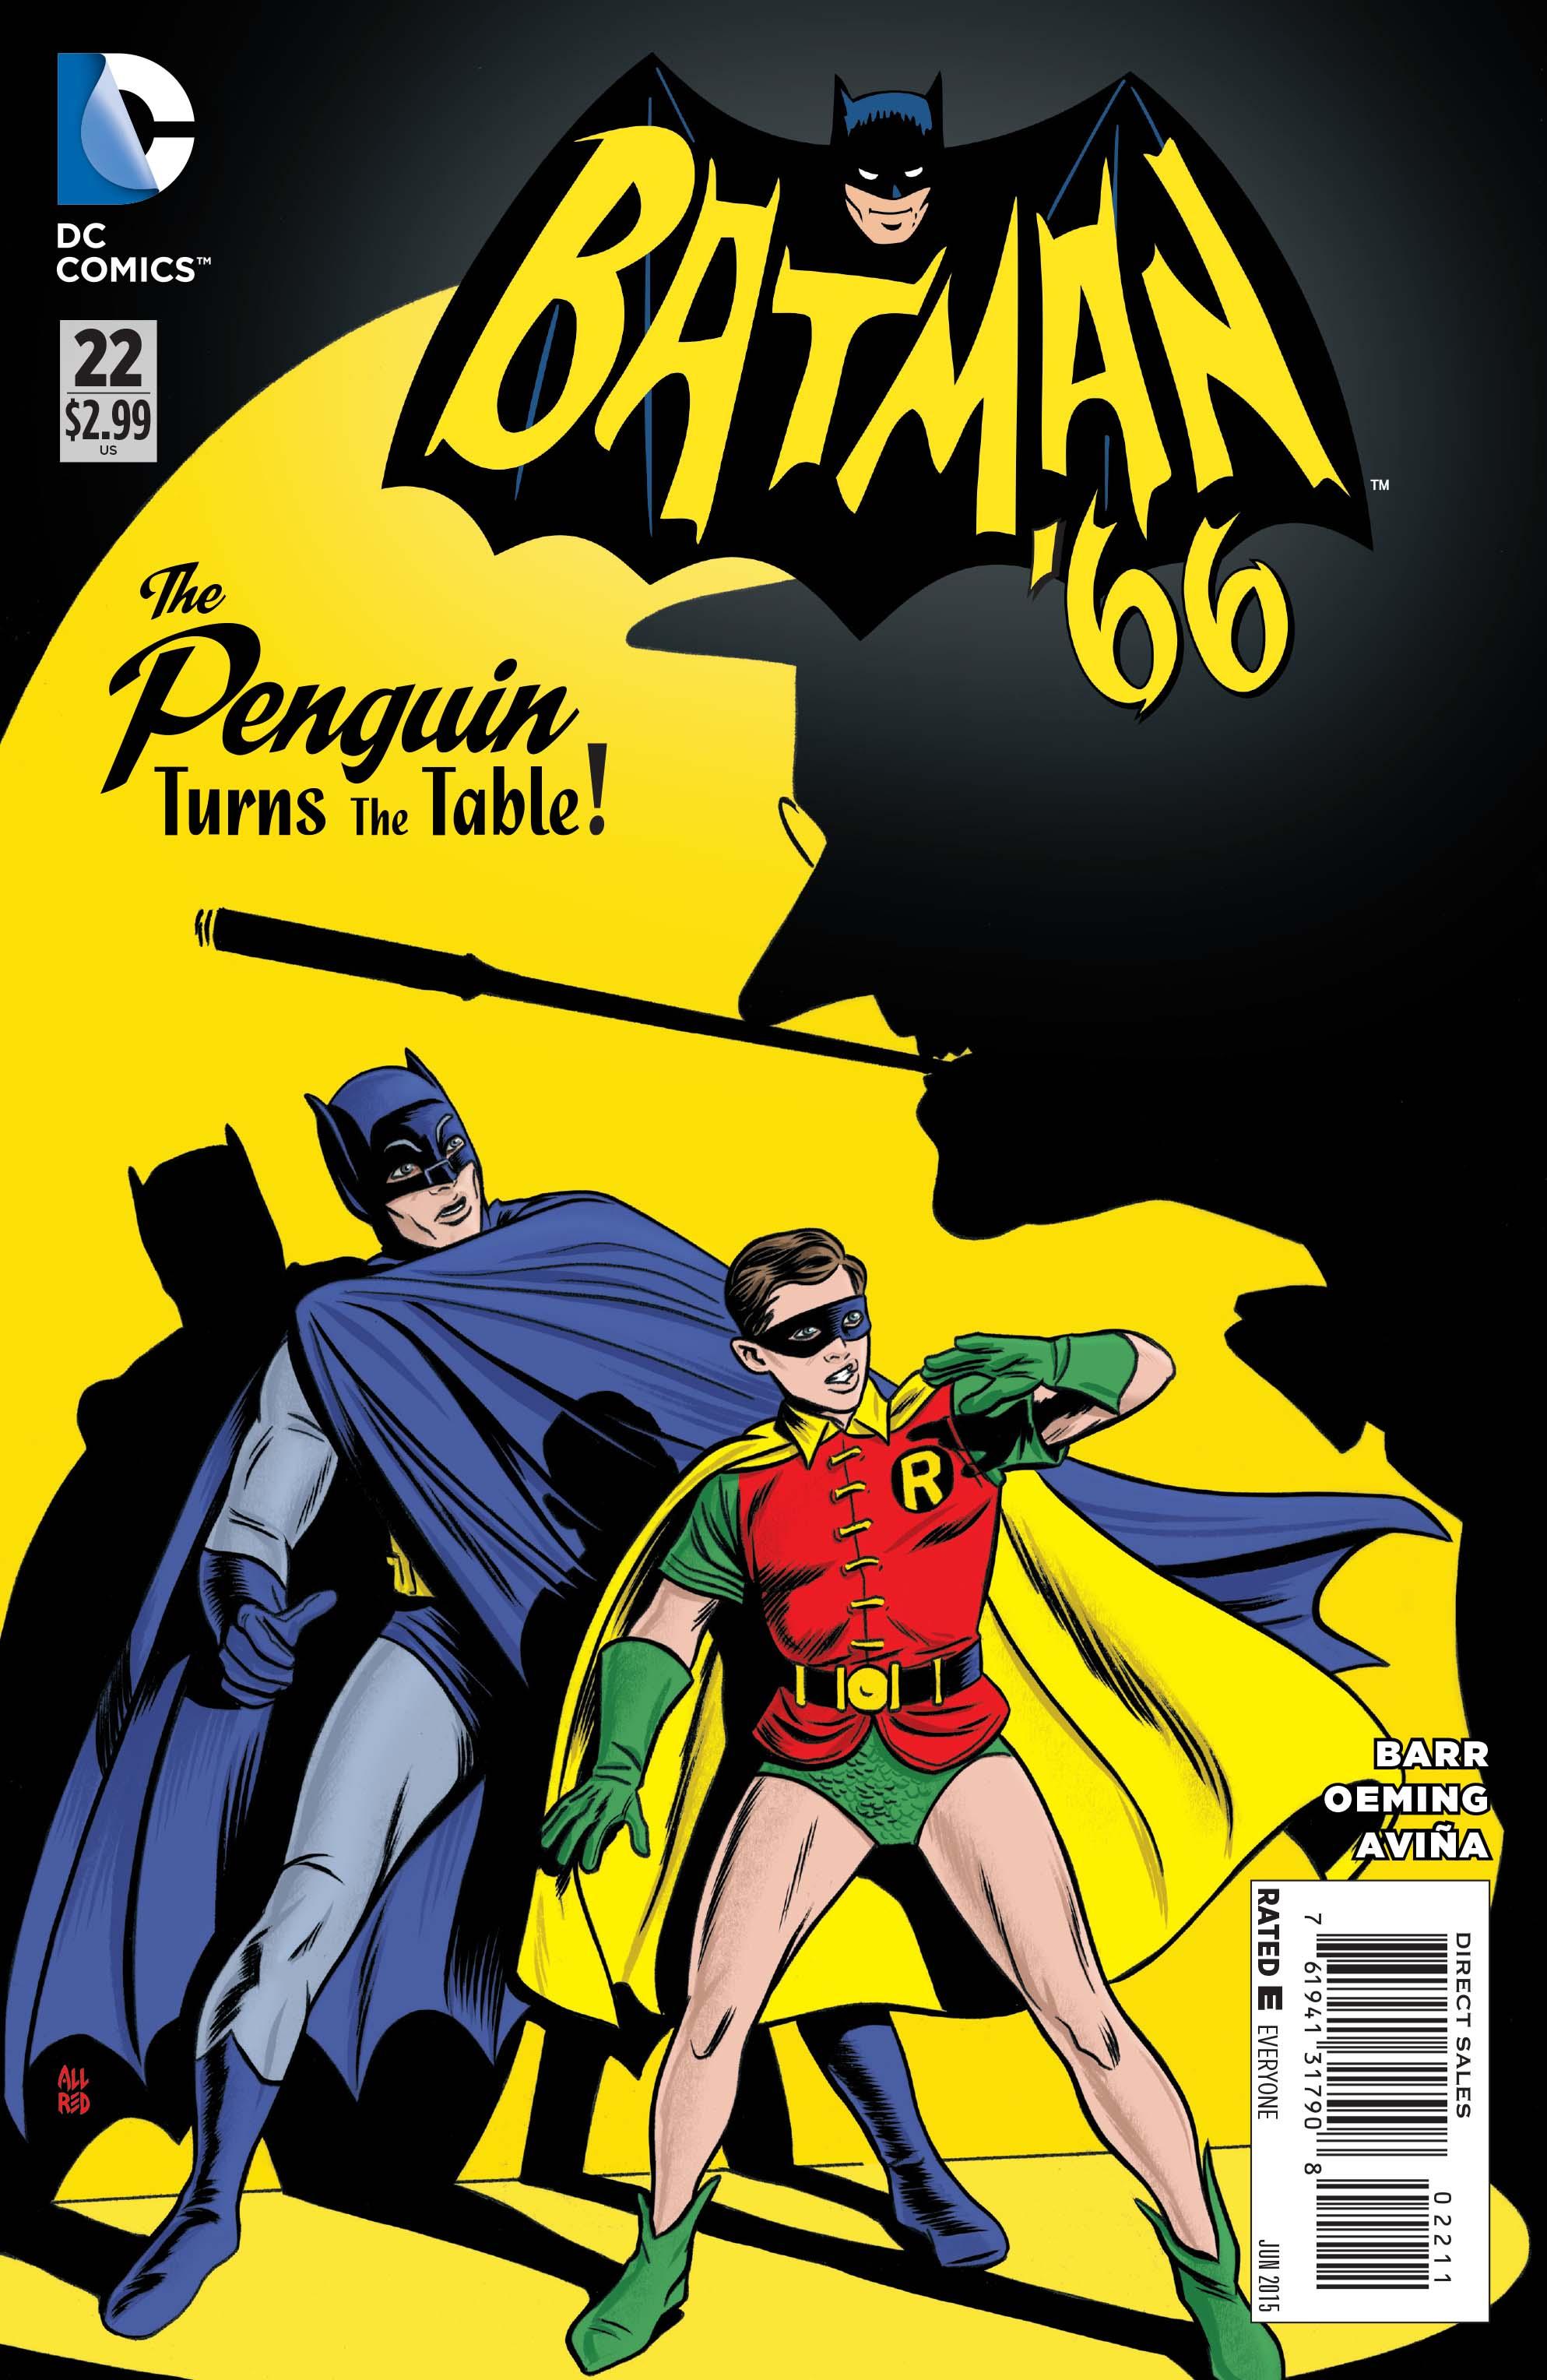 Exclusive Preview Batman 66 22 13th Dimension Comics